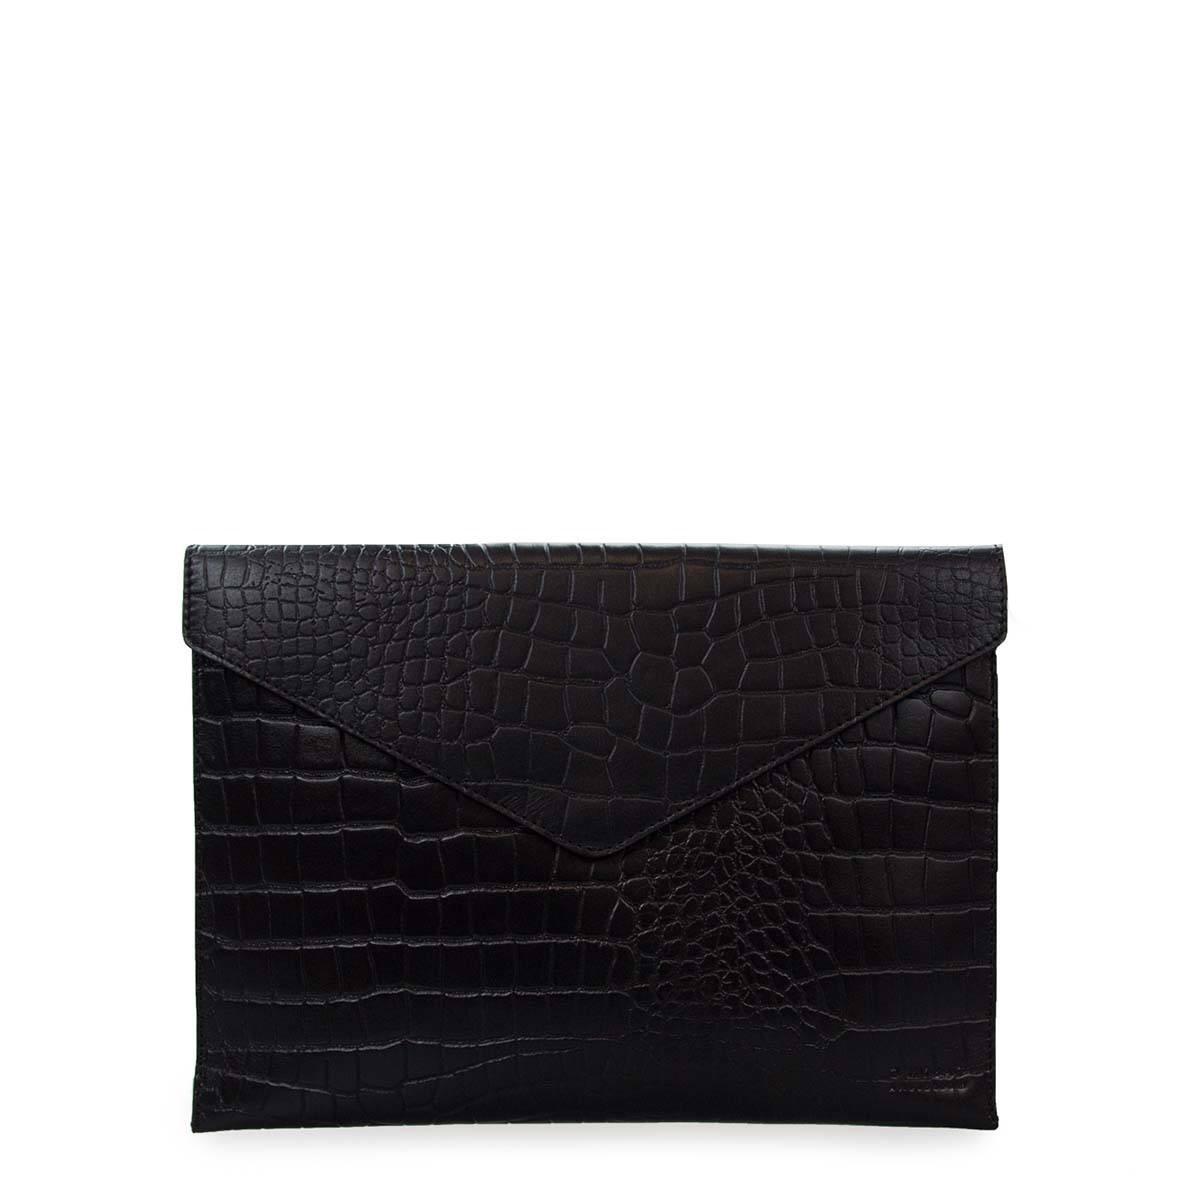 aa1625f210e Laptop tassen online bestellen | Fashionchick.nl | Groot aanbod